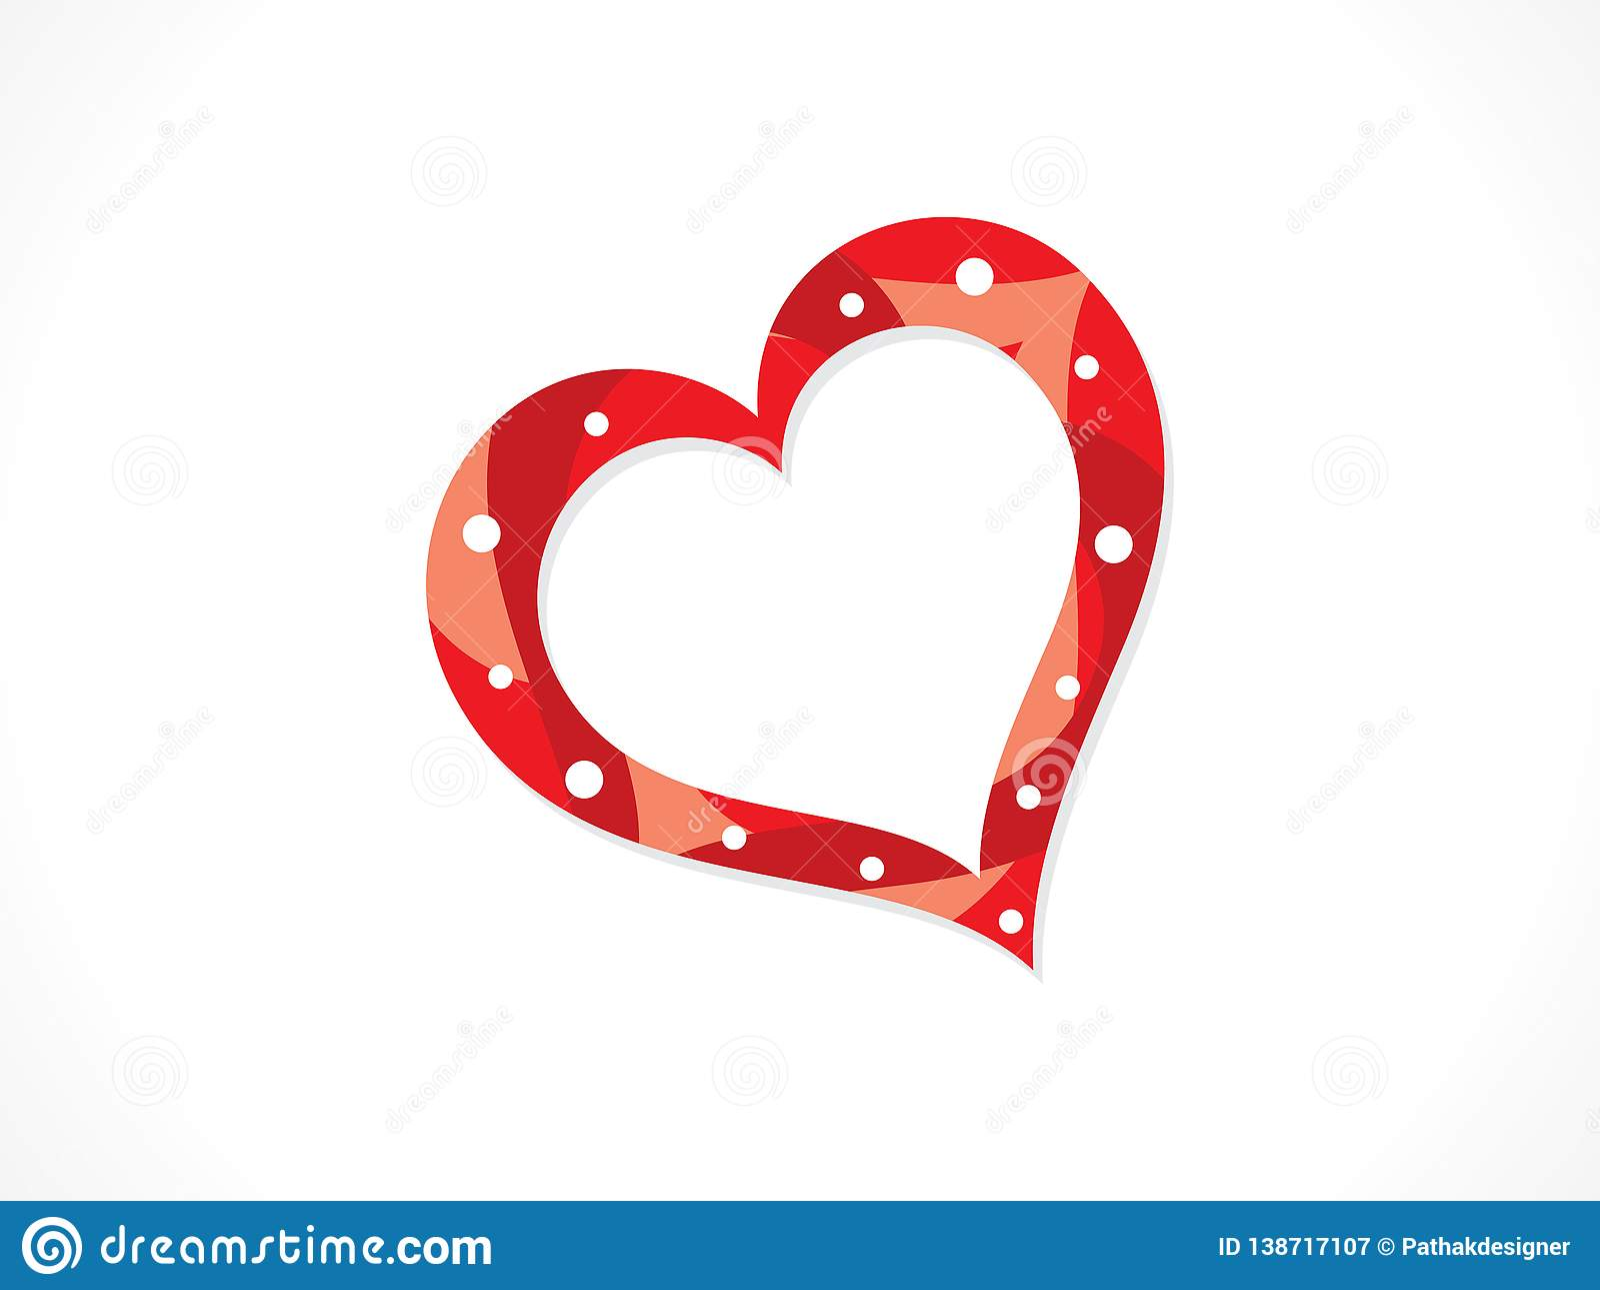 Abstract artistic creative love heart